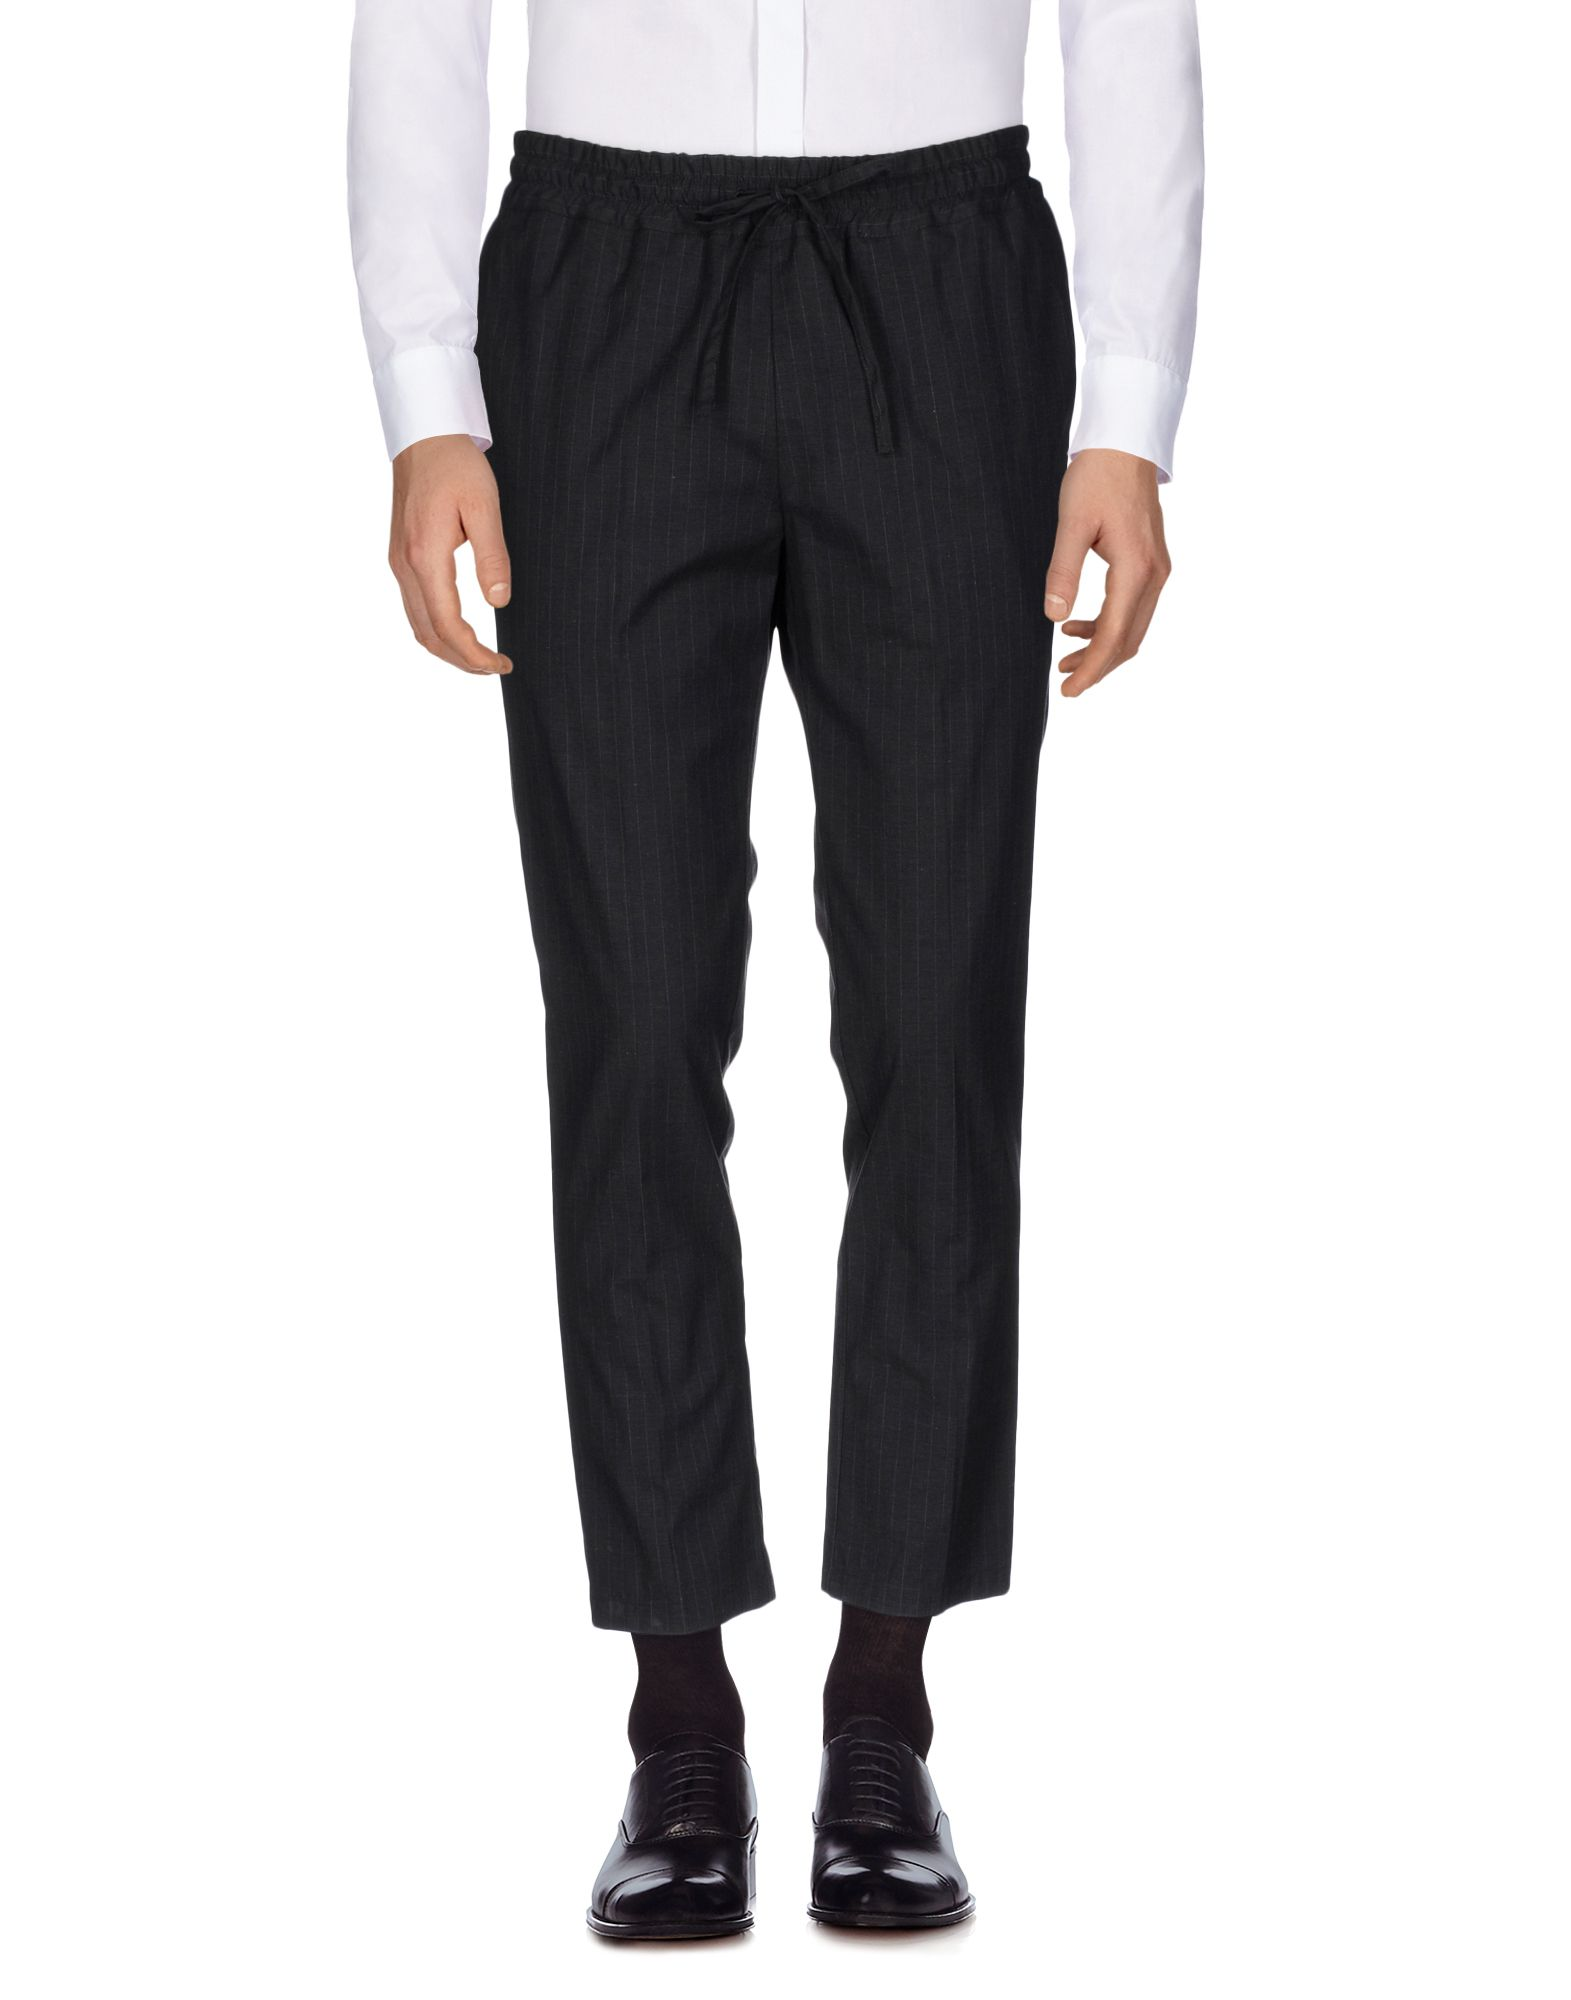 Pantalone Pantalone Aglini uomo - 13065455JT  Outlet-Verkauf